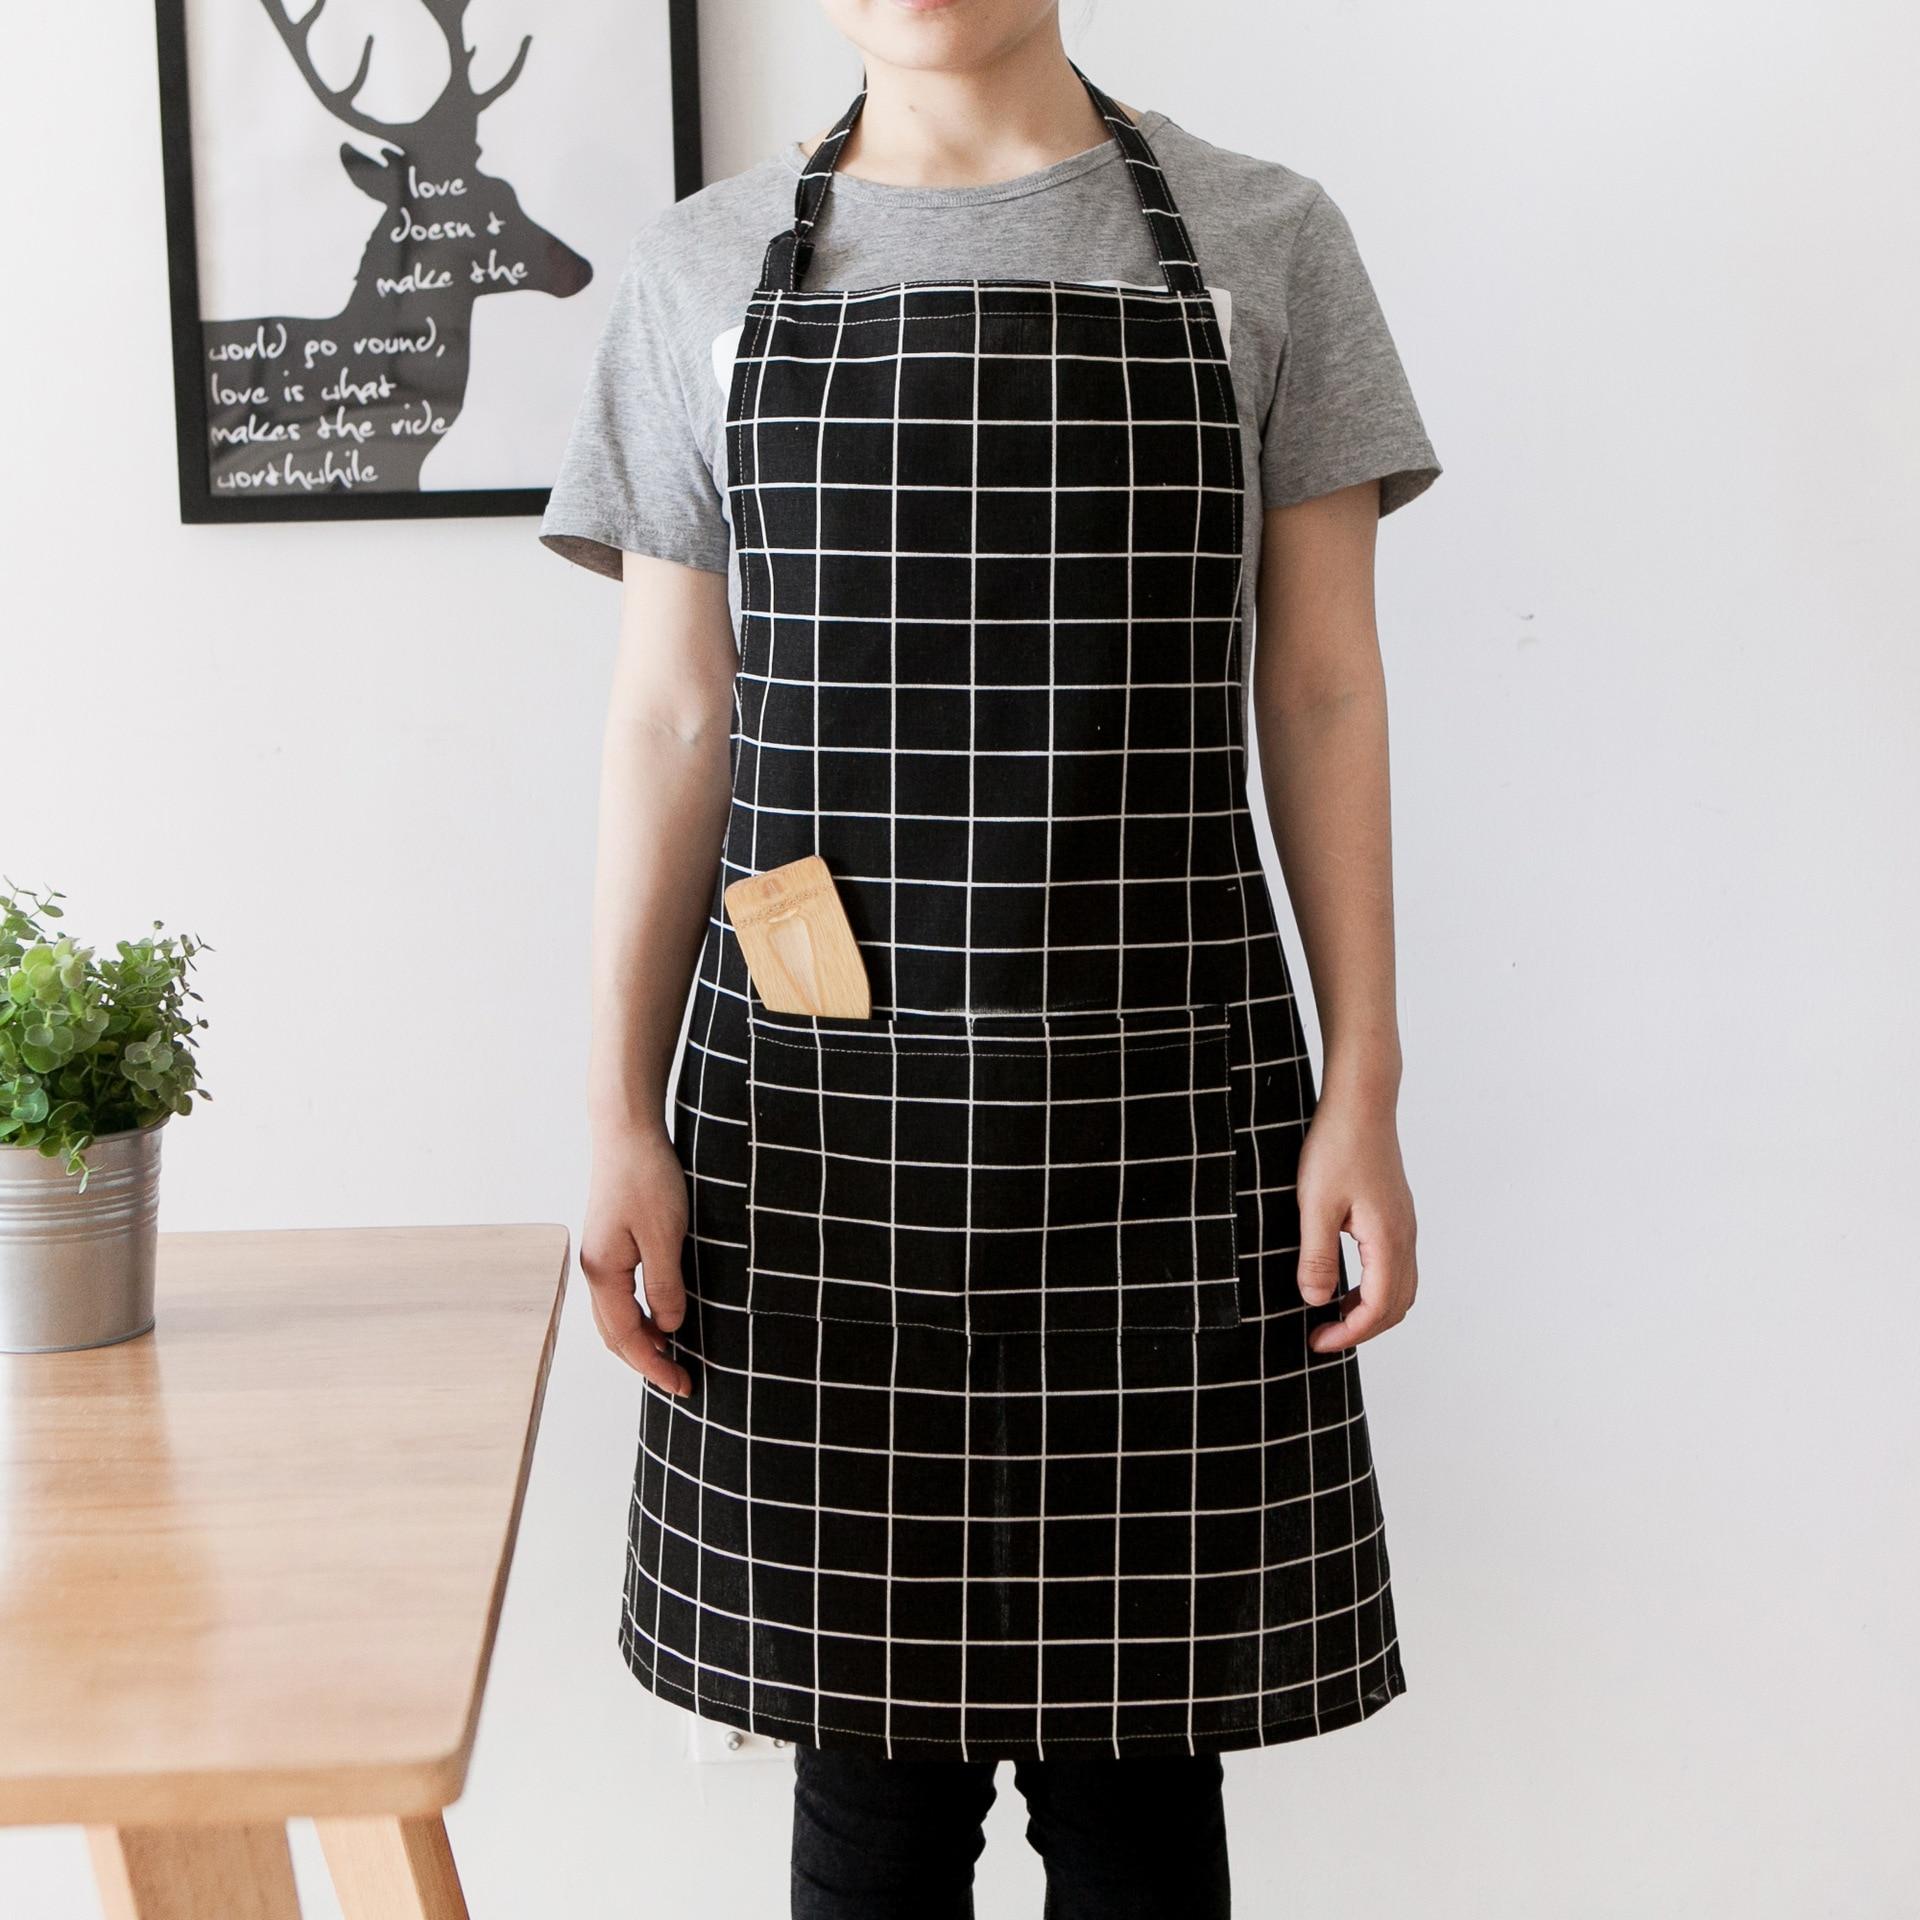 High-grade Kitchen Apron For Cooking Baking Adjustable Cotton Fashion Linen